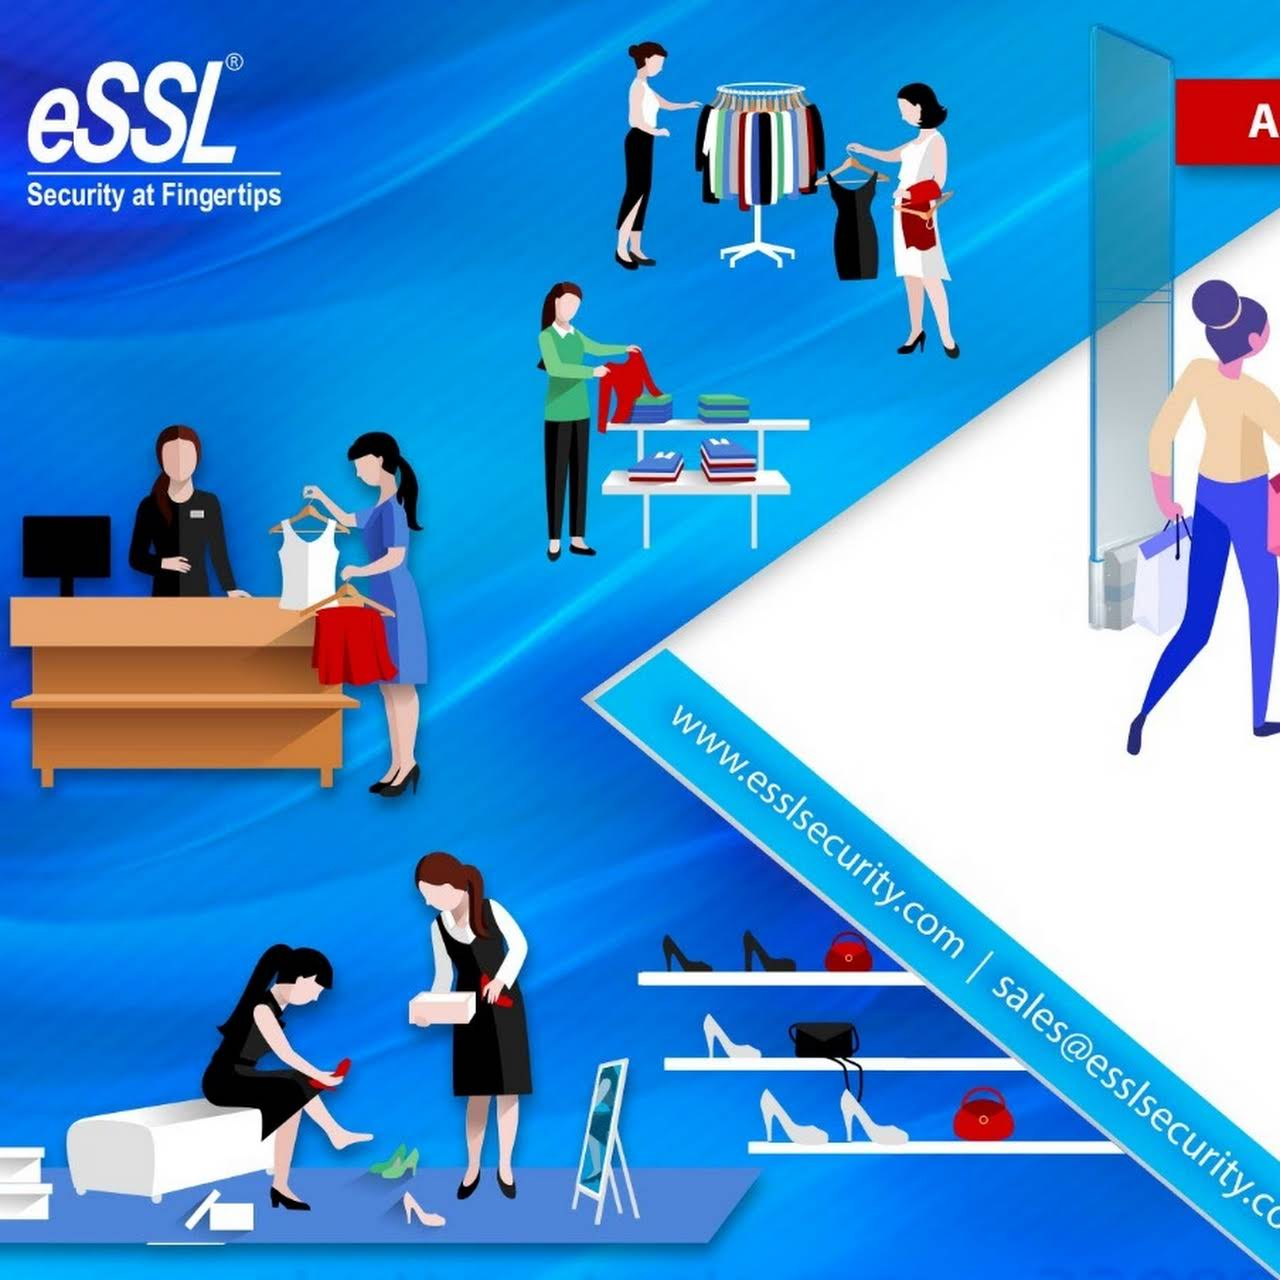 eSSL Chennai - Official - India's No 1 Biometric & Gate